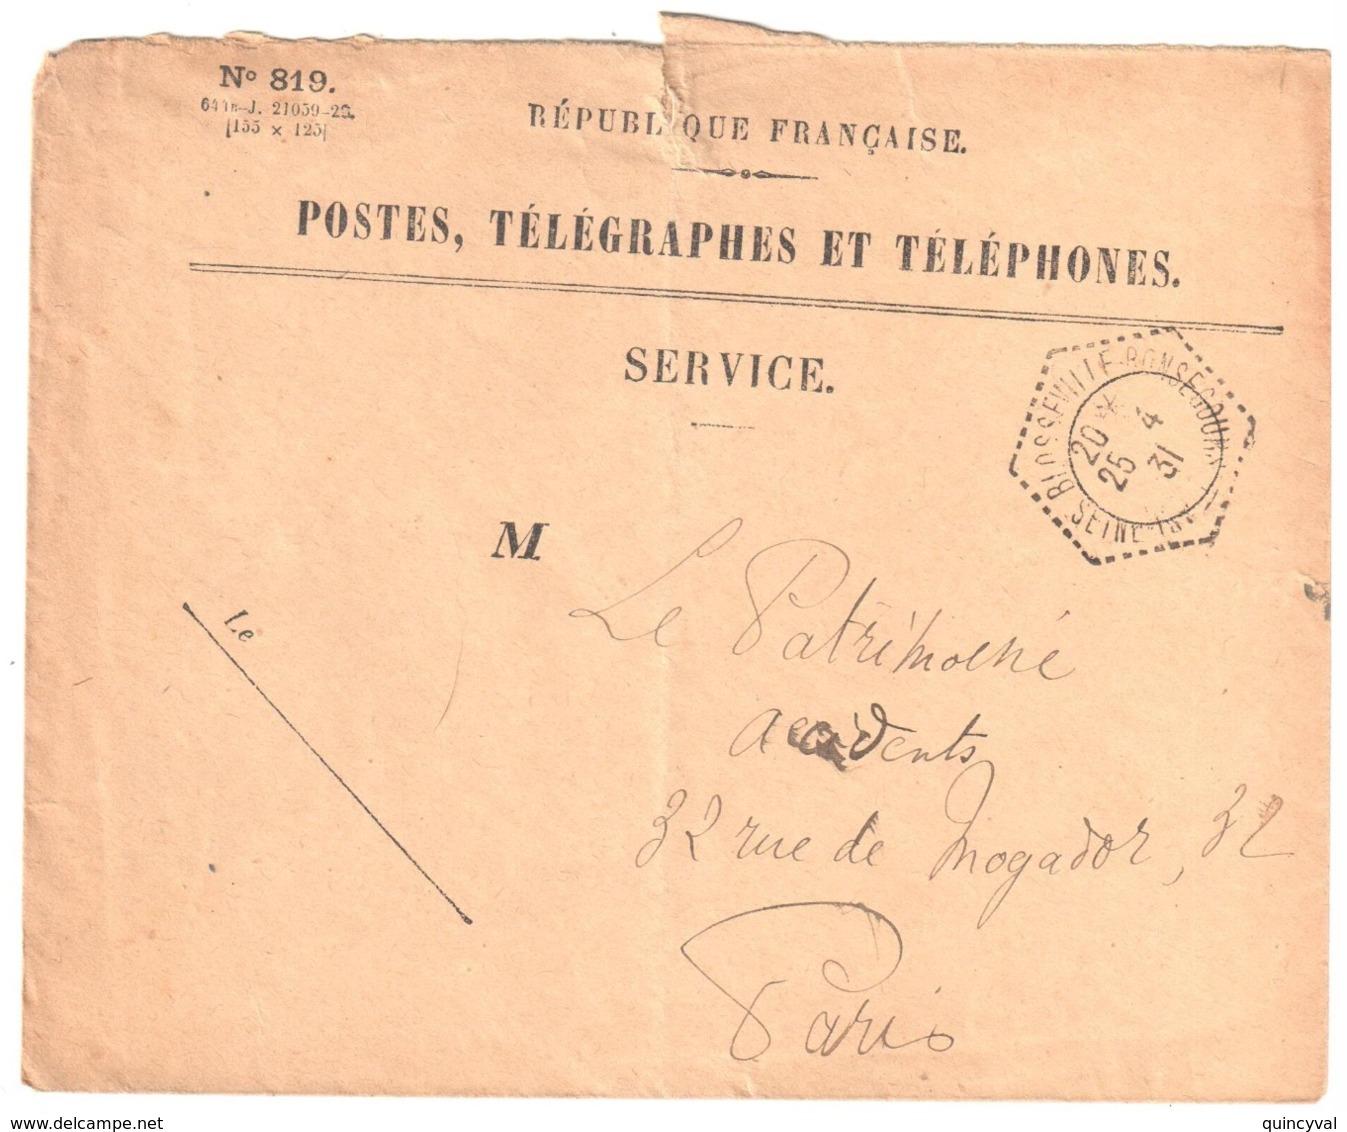 BLOSSEVILLE BONSECOURS Seine Inf Enveloppe SERVICE N° 819 Franchise Ob 1931 Agence Postale Hexagone Pointillé Lautier F4 - Manual Postmarks